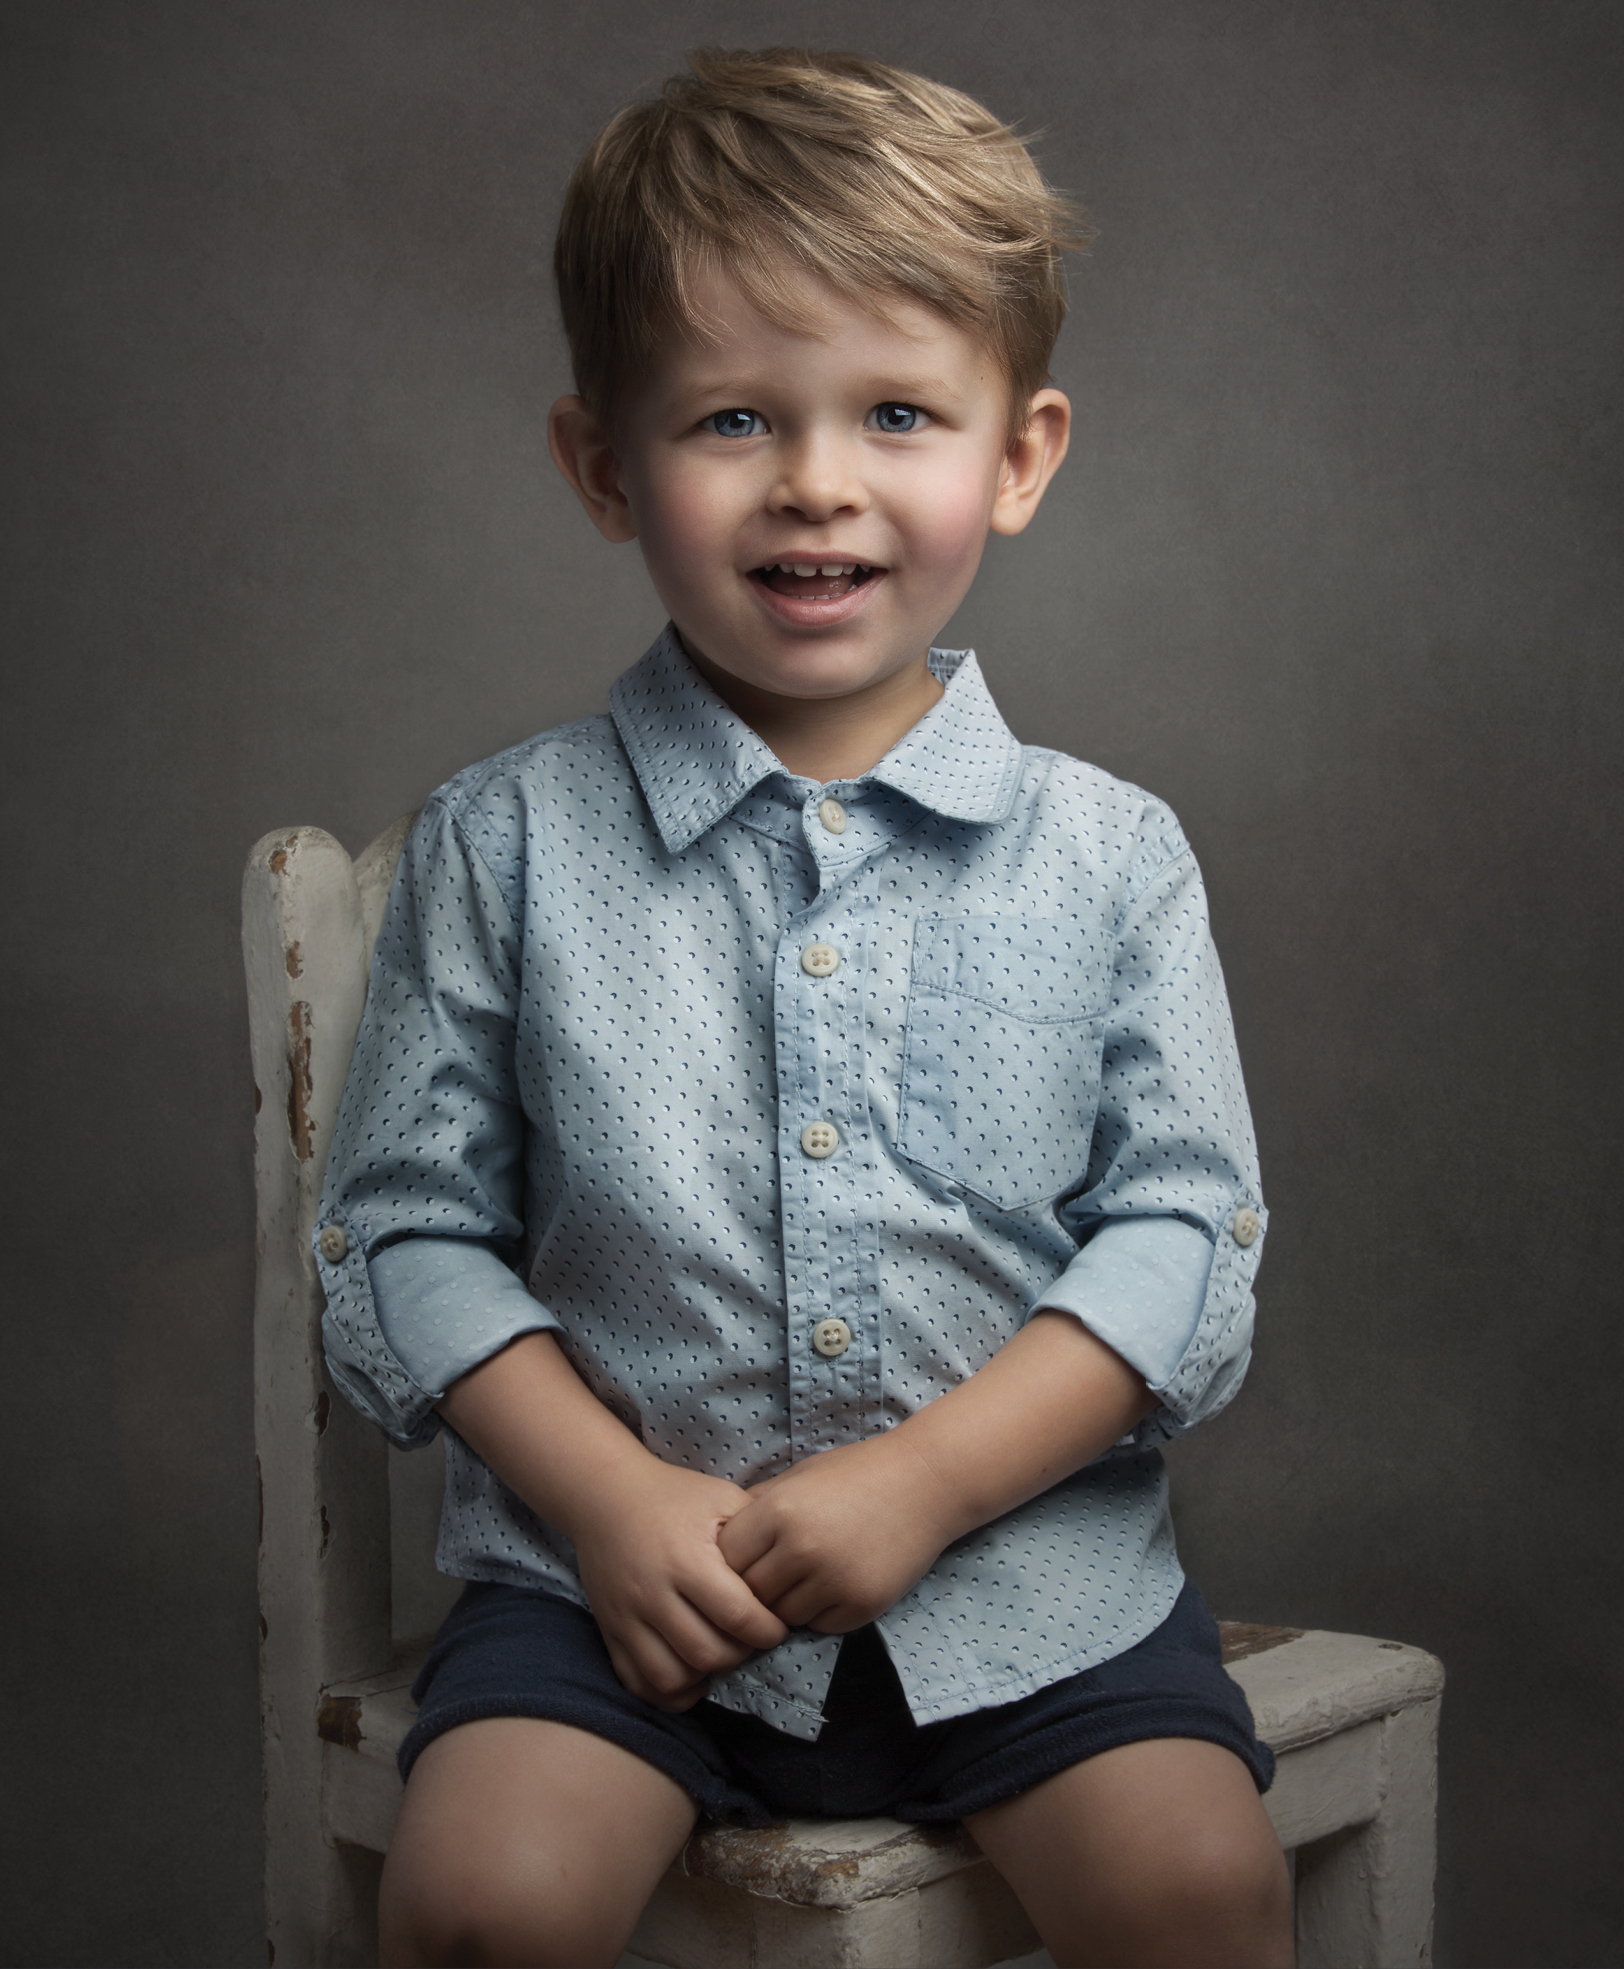 FIne-Art-Child-Portraits-7.jpg